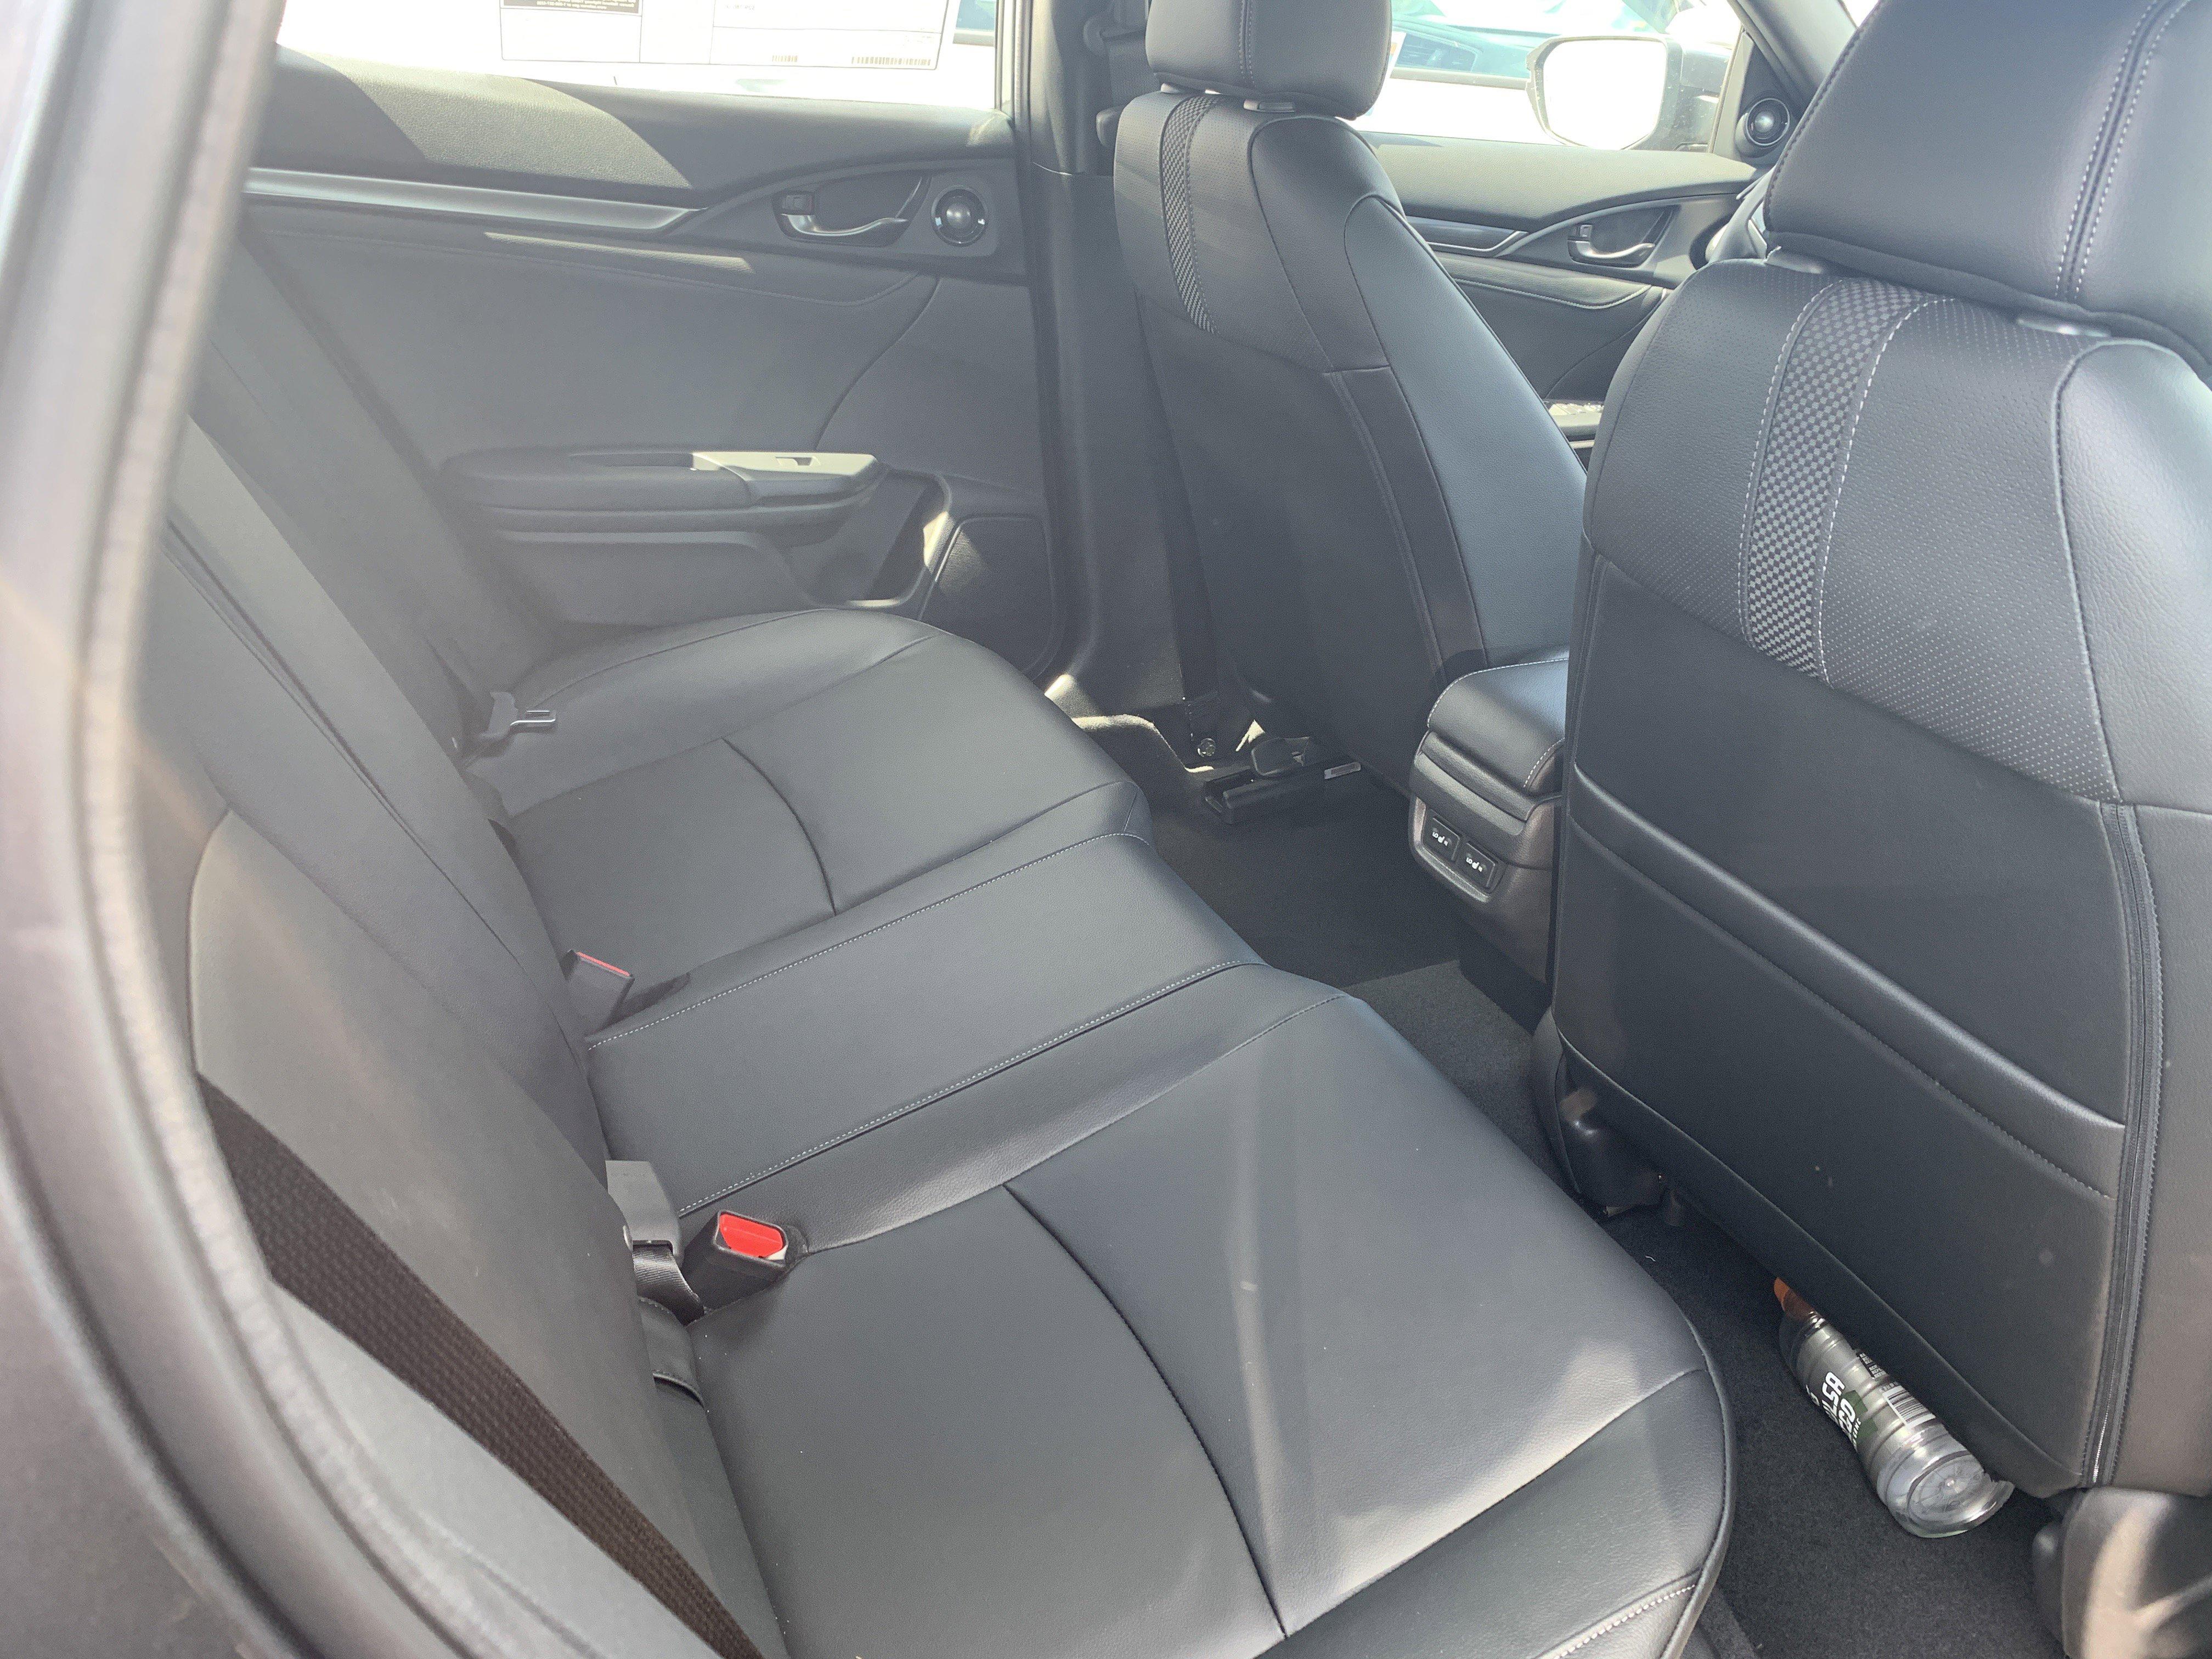 New 2020 Honda Civic Hatchback Sport Touring